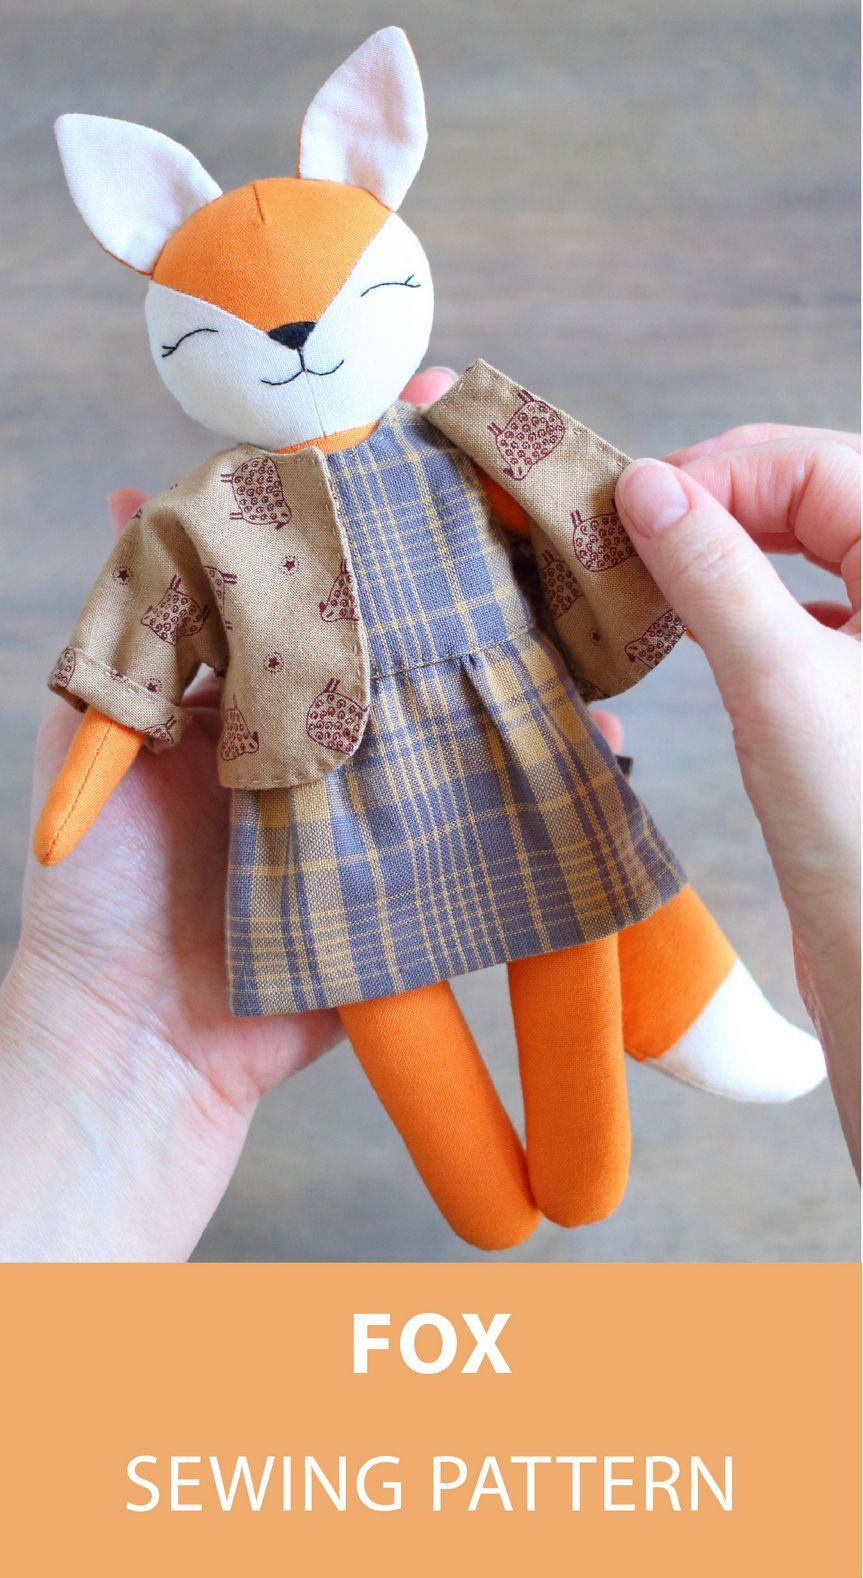 Fox Sewing Pattern, Forest Animal Doll Pattern, Fox Doll, Cloth Doll, Stuffed Woodland Animal, Plushie, Soft Toy, Plush Fox with Clothes #etsy #sewingpattern #fox #softie #instructionstodollpatterns